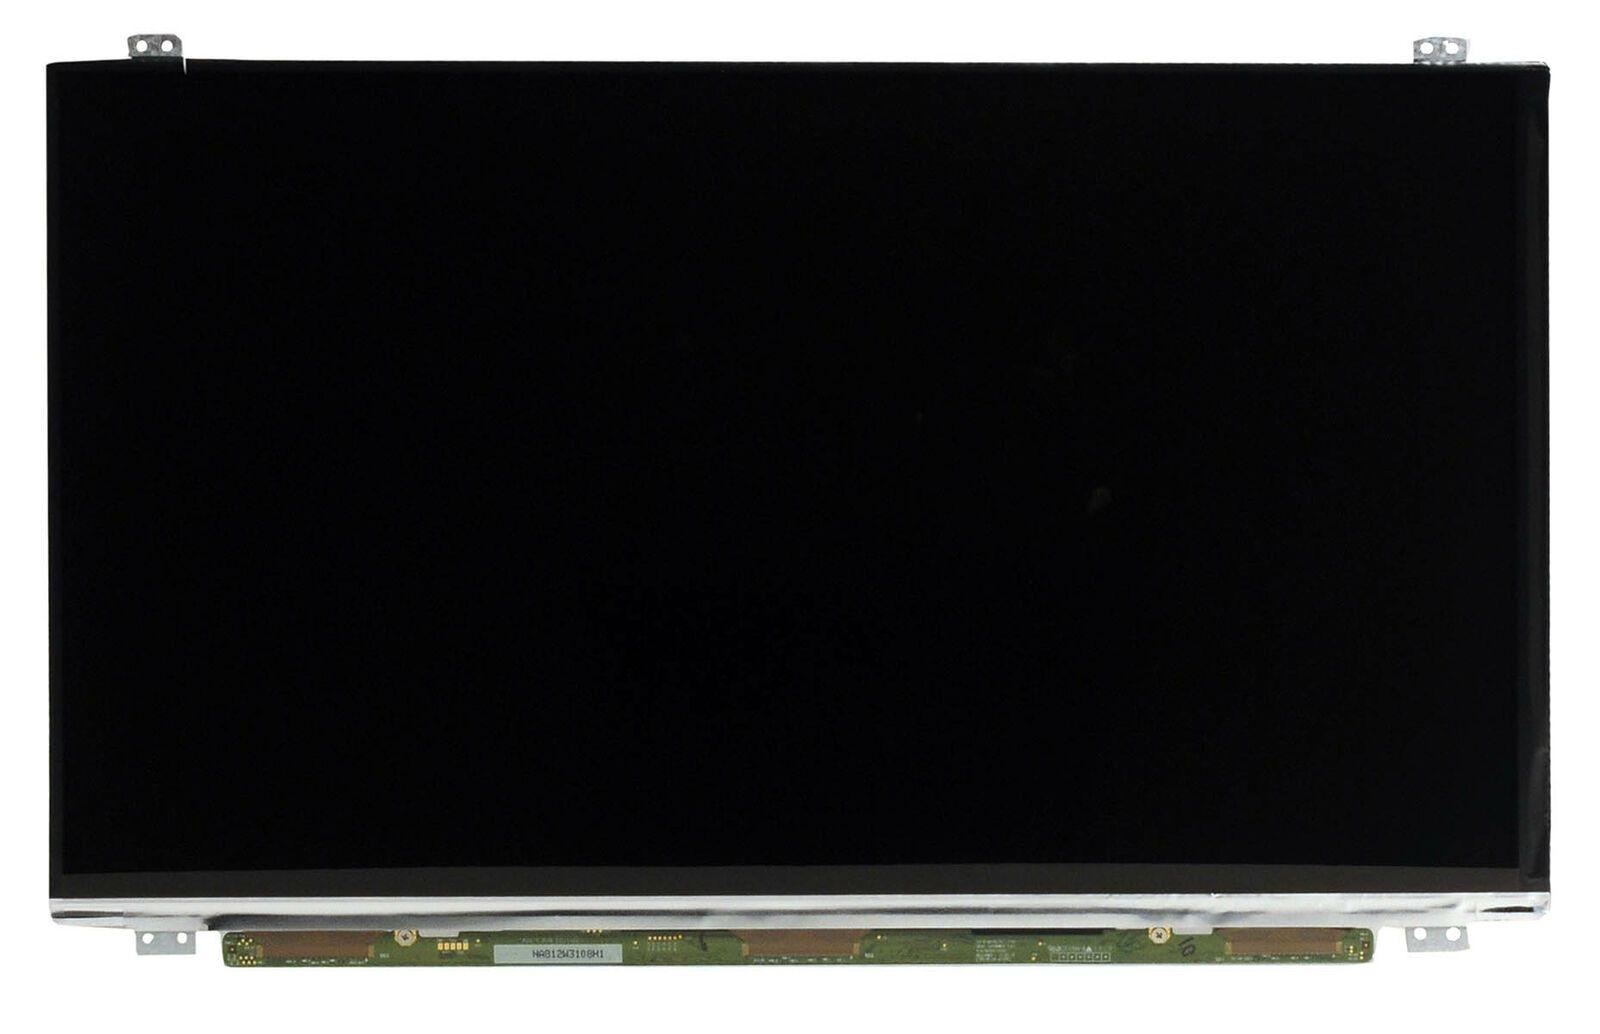 Tela 15.6 Led Slim Para Sony Vaio Sve151j11x L M W  1366x768 - EASY HELP NOTE